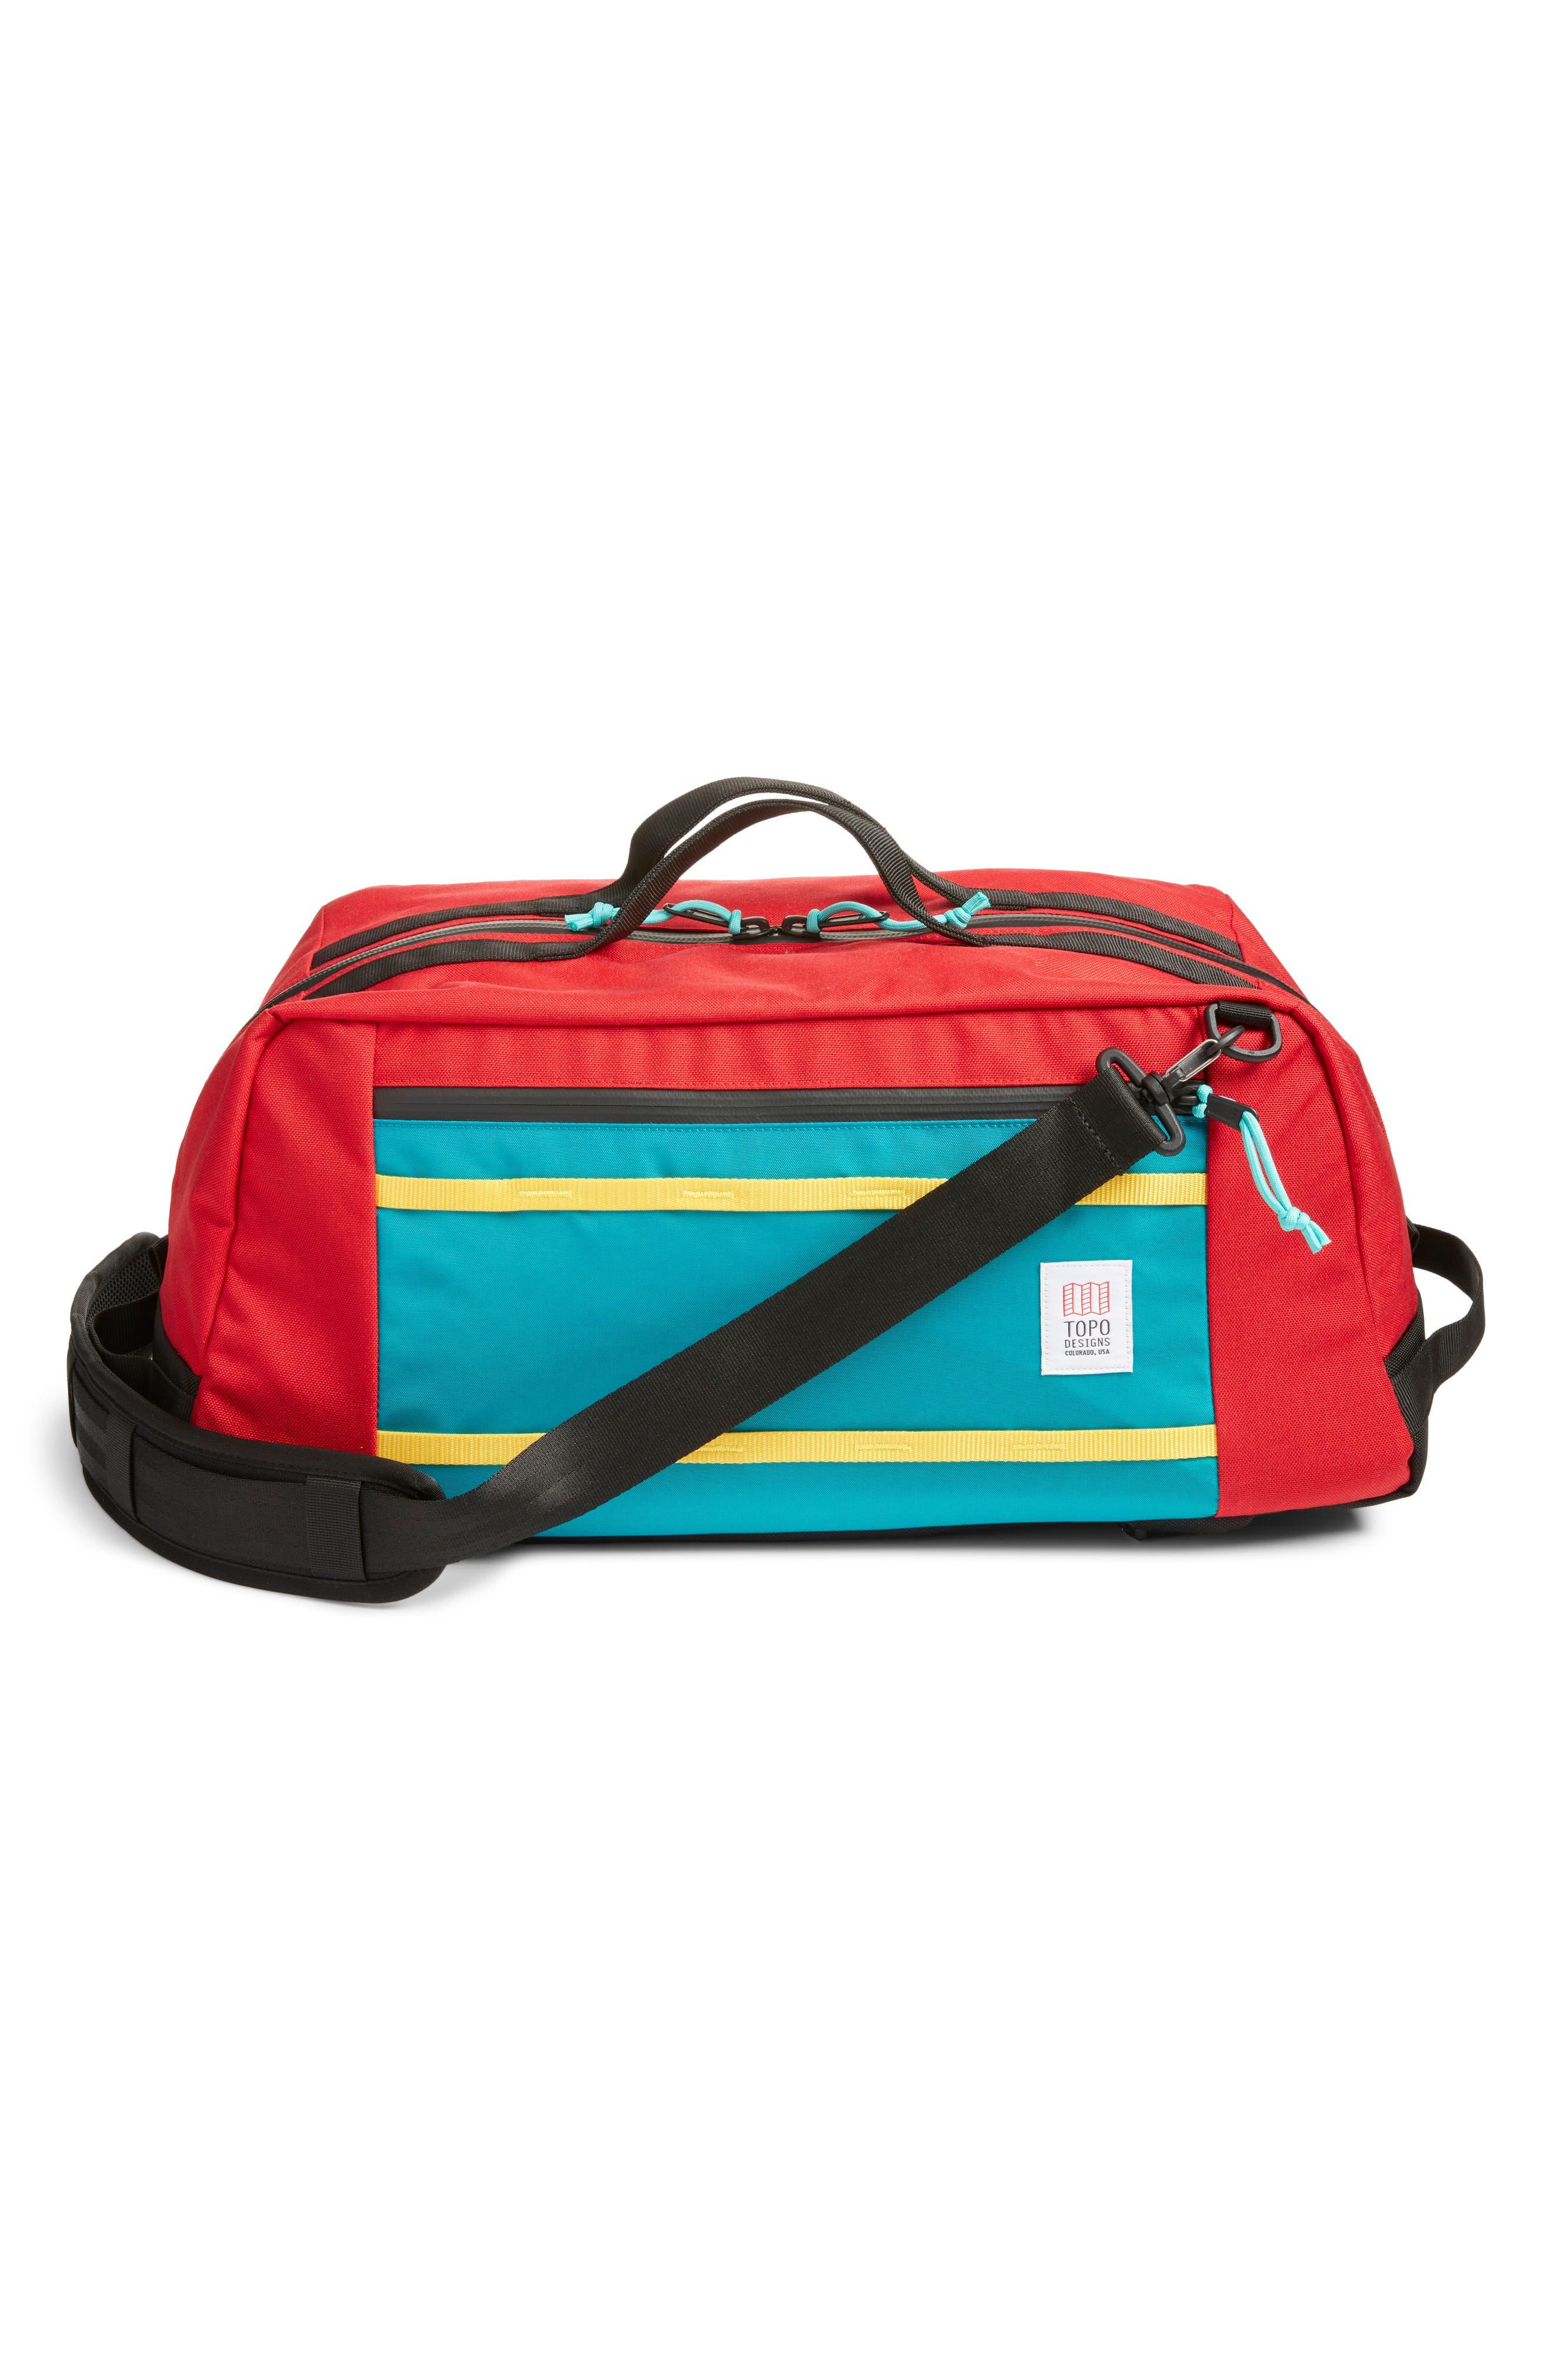 Mountain 40L Convertible Duffel Bag,                             Main thumbnail 1, color,                             600